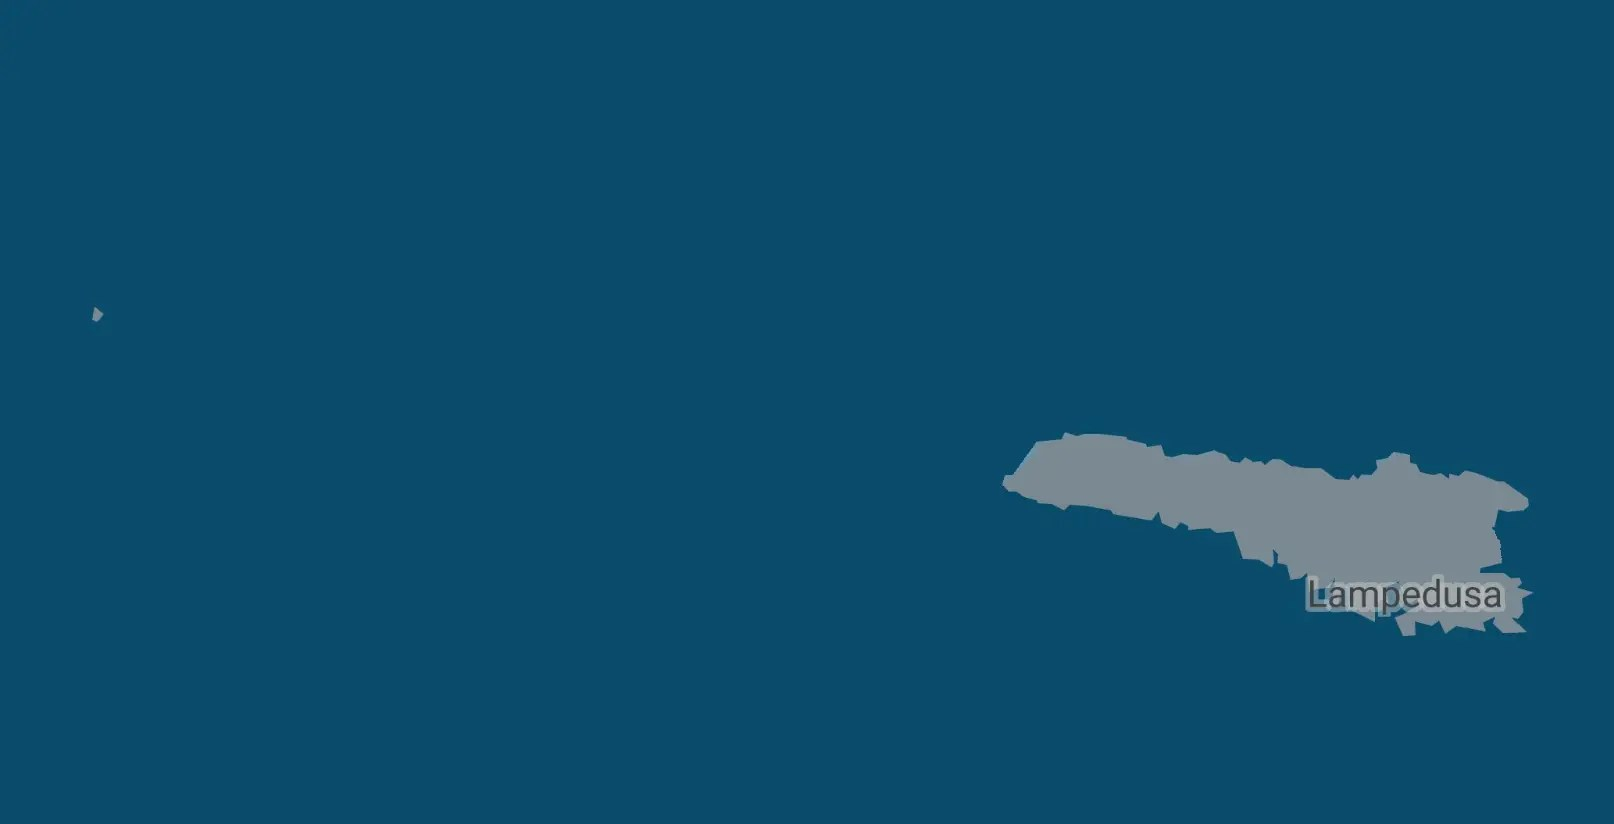 LampedusaeLampione mappa